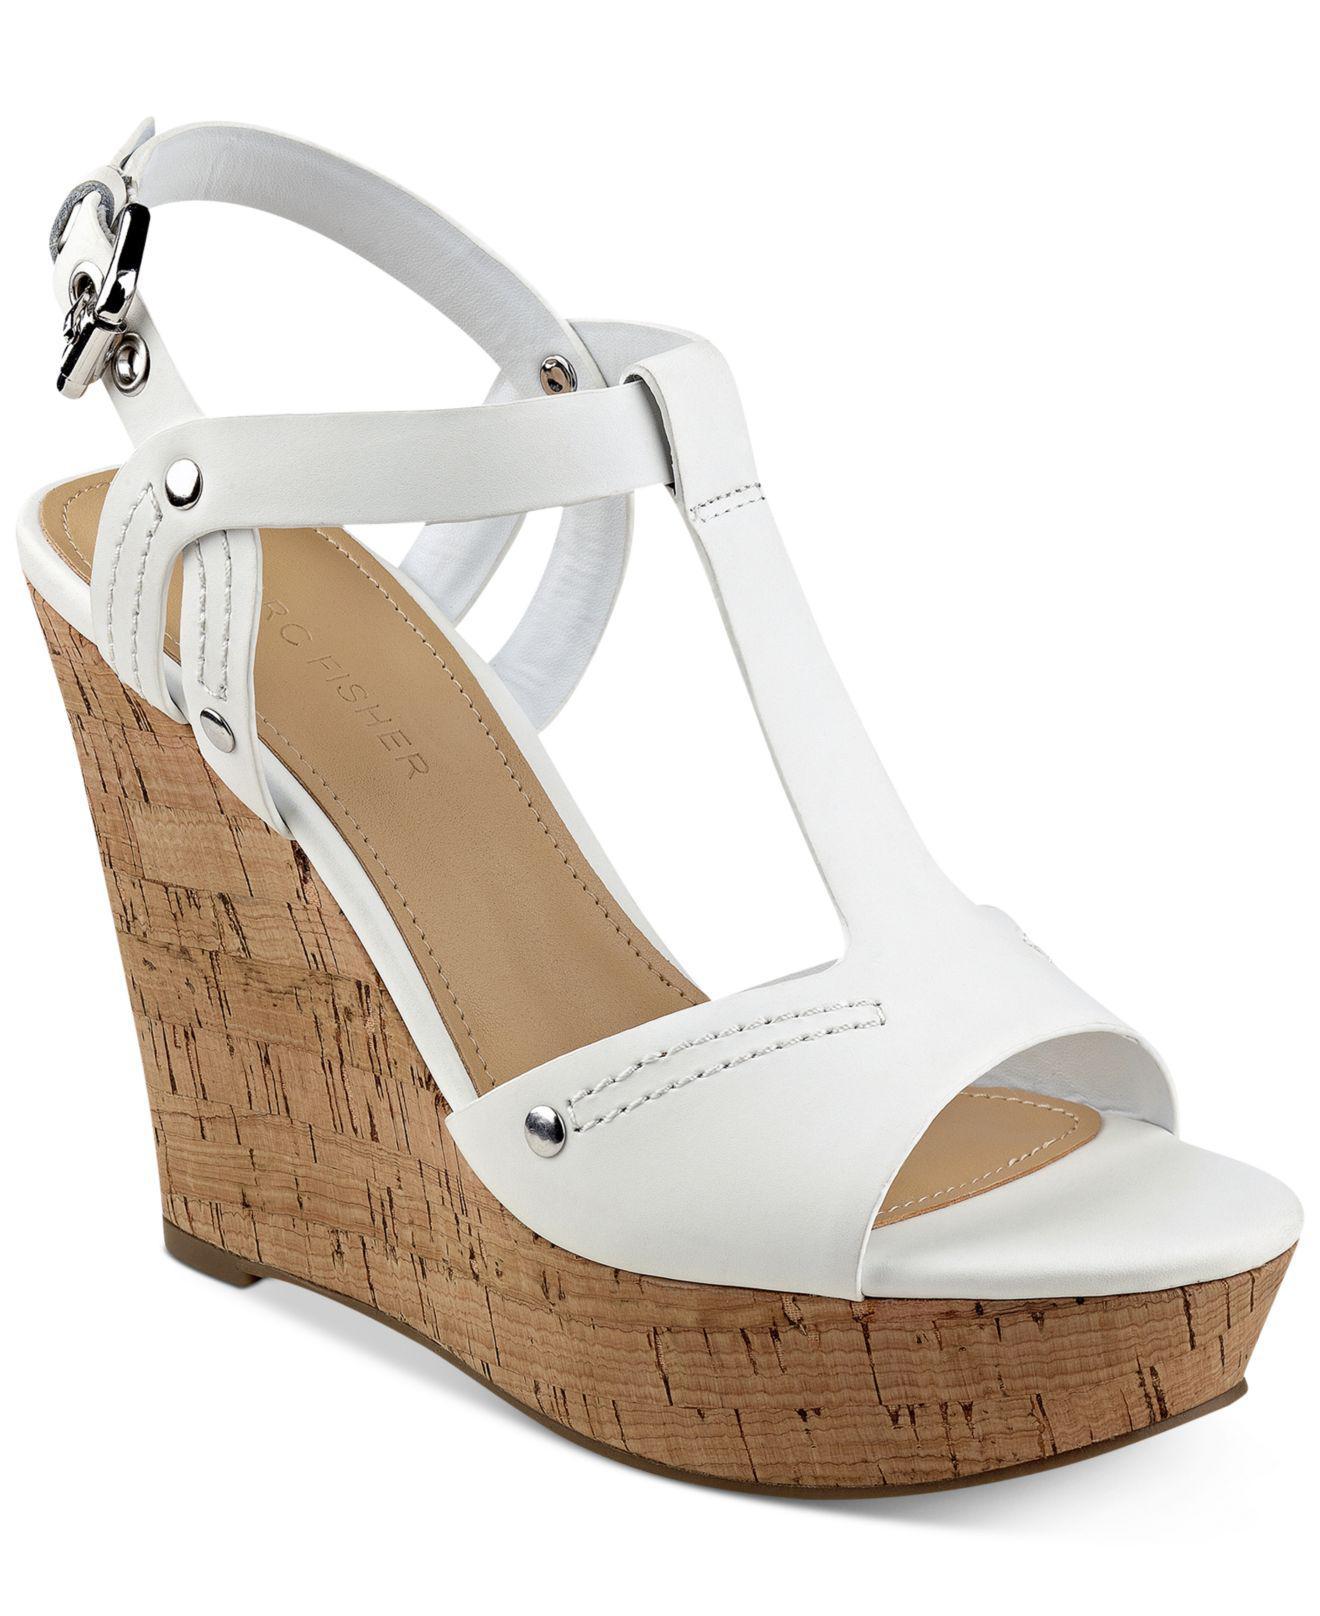 34683ccd10c Lyst - Marc Fisher Helma Platform Wedge Sandals in White